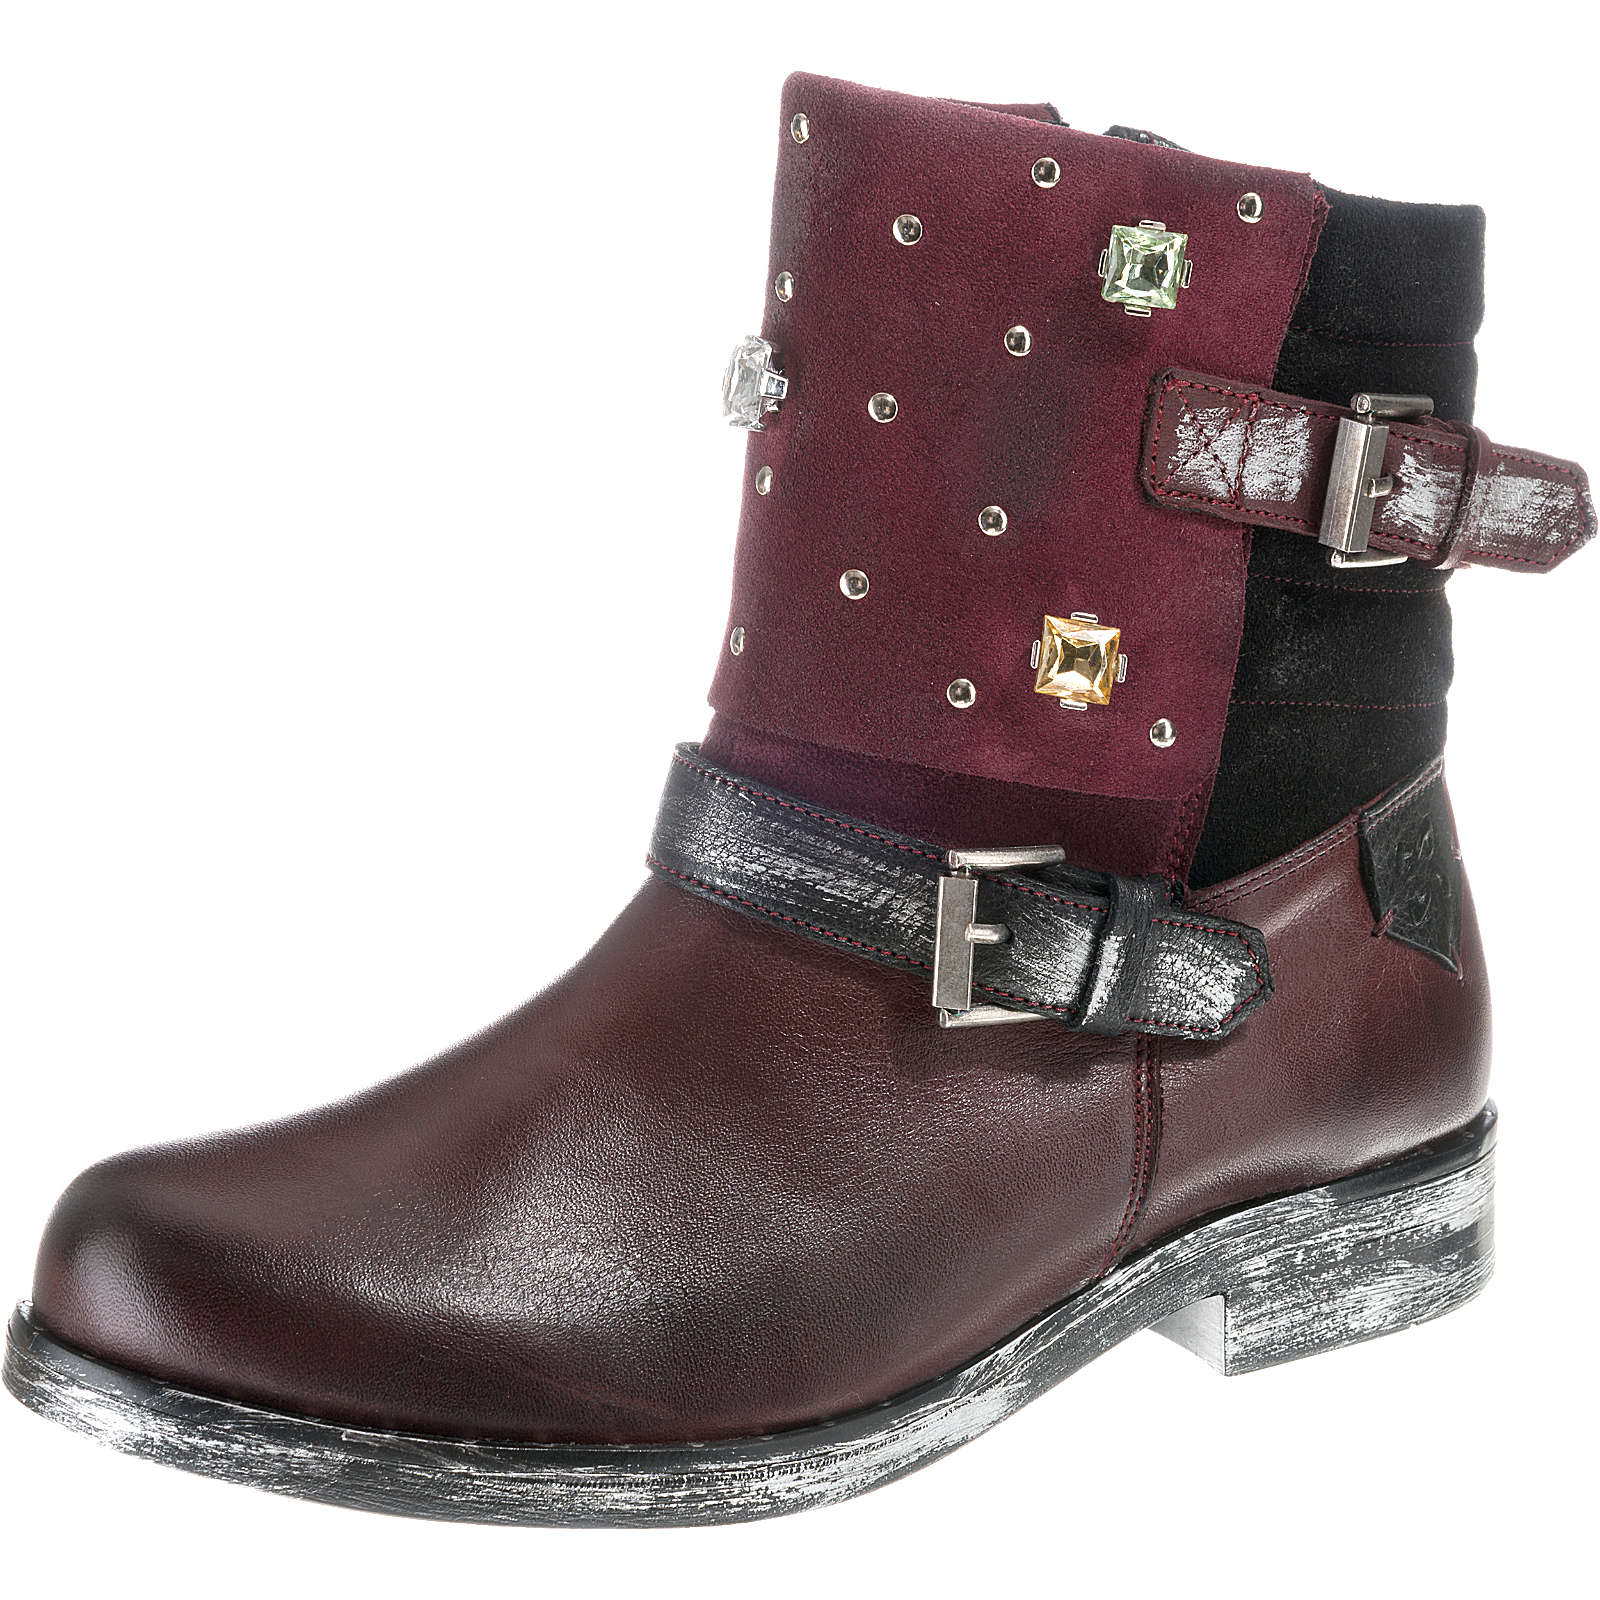 Maciejka Biker Boots bordeaux Damen Gr. 41